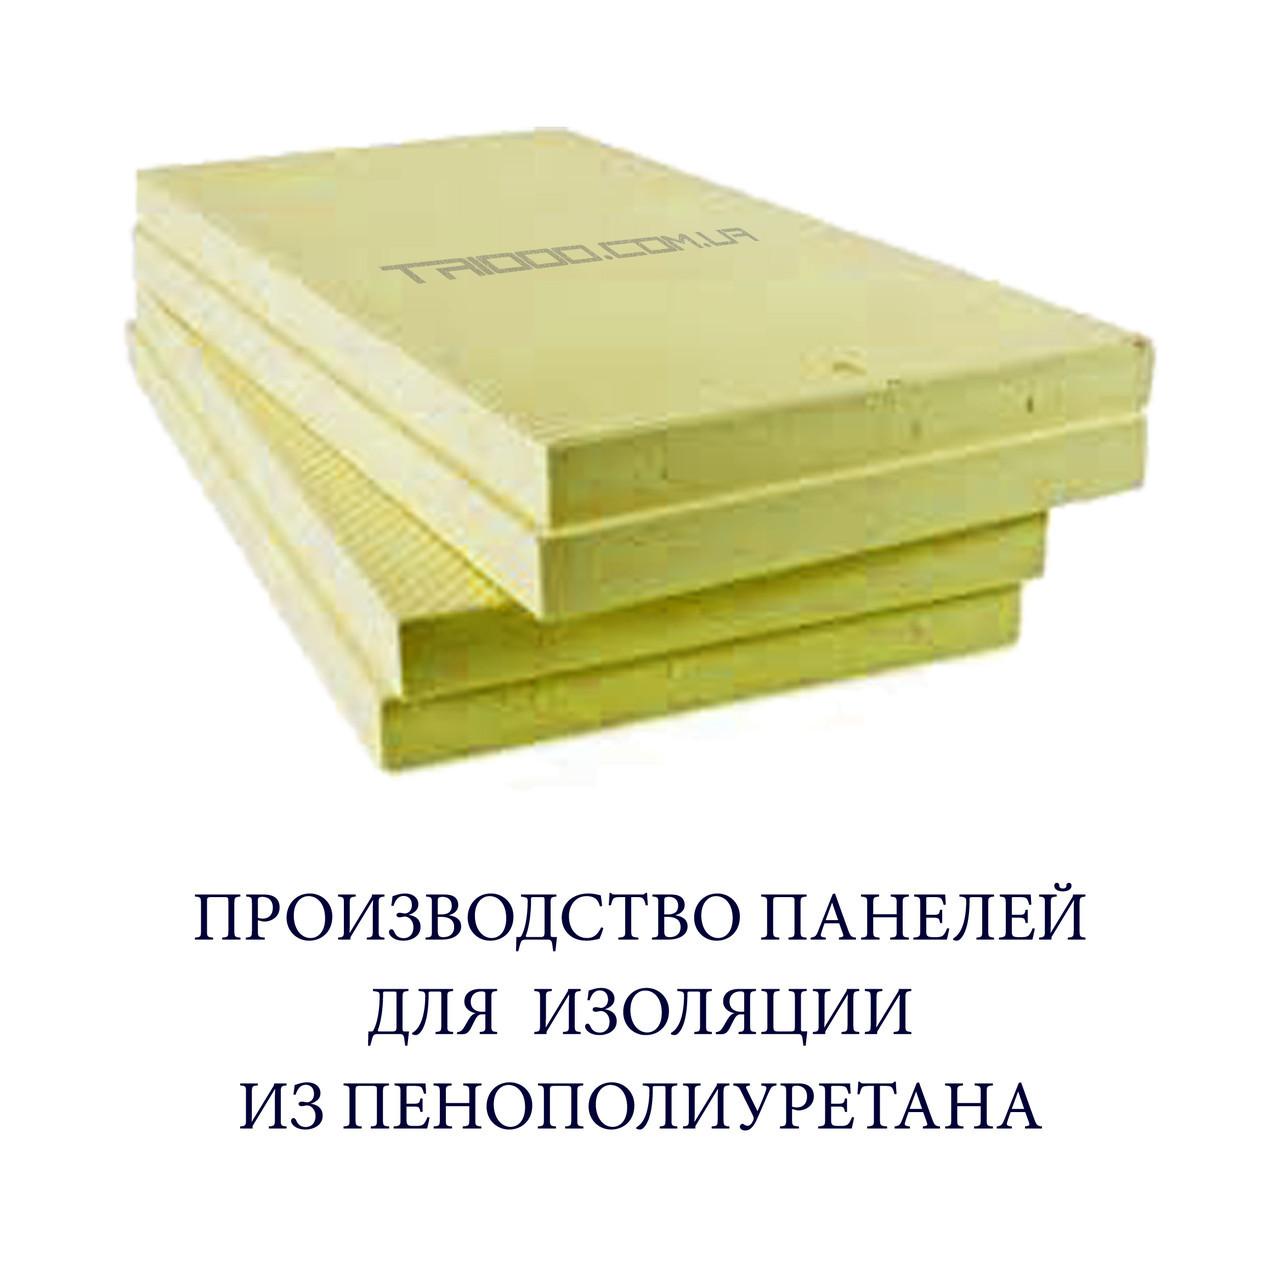 Плита пенополиуретановая (панель ППУ) 900 х 600 х 60 мм